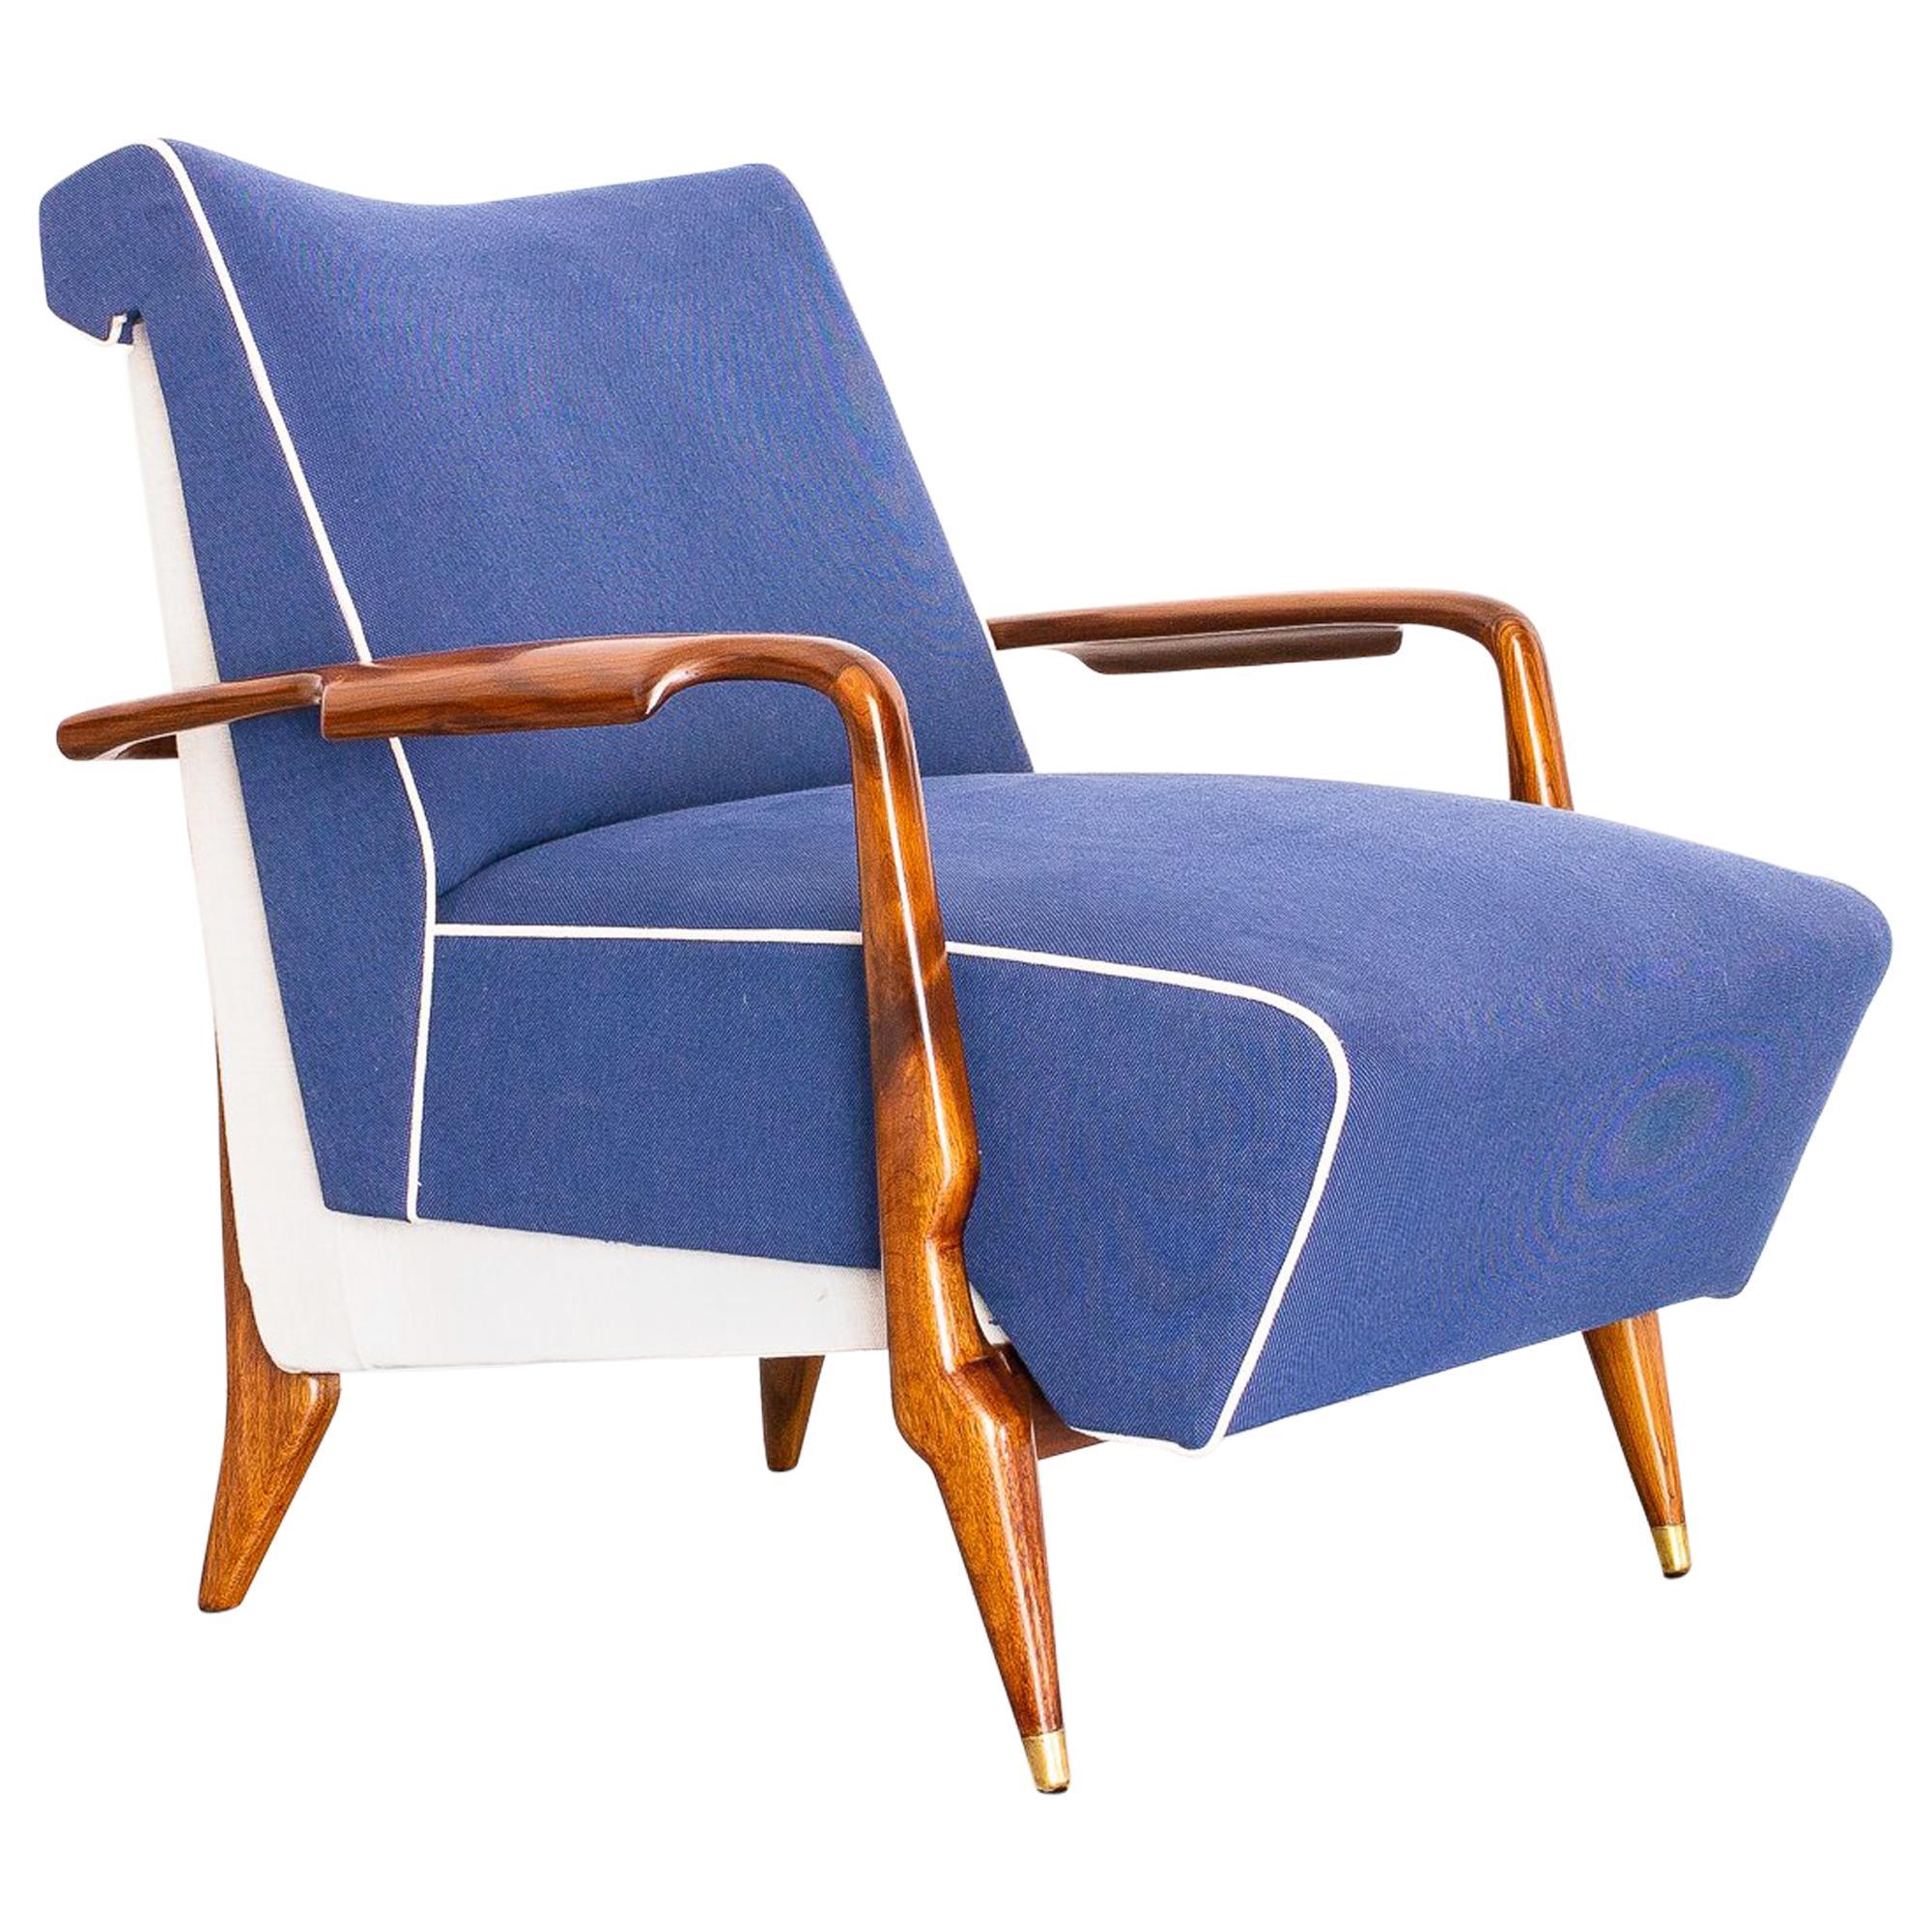 1950s Pair of Lounge Chairs in Imbuia Wood, Brazilian Mid-Century Modern